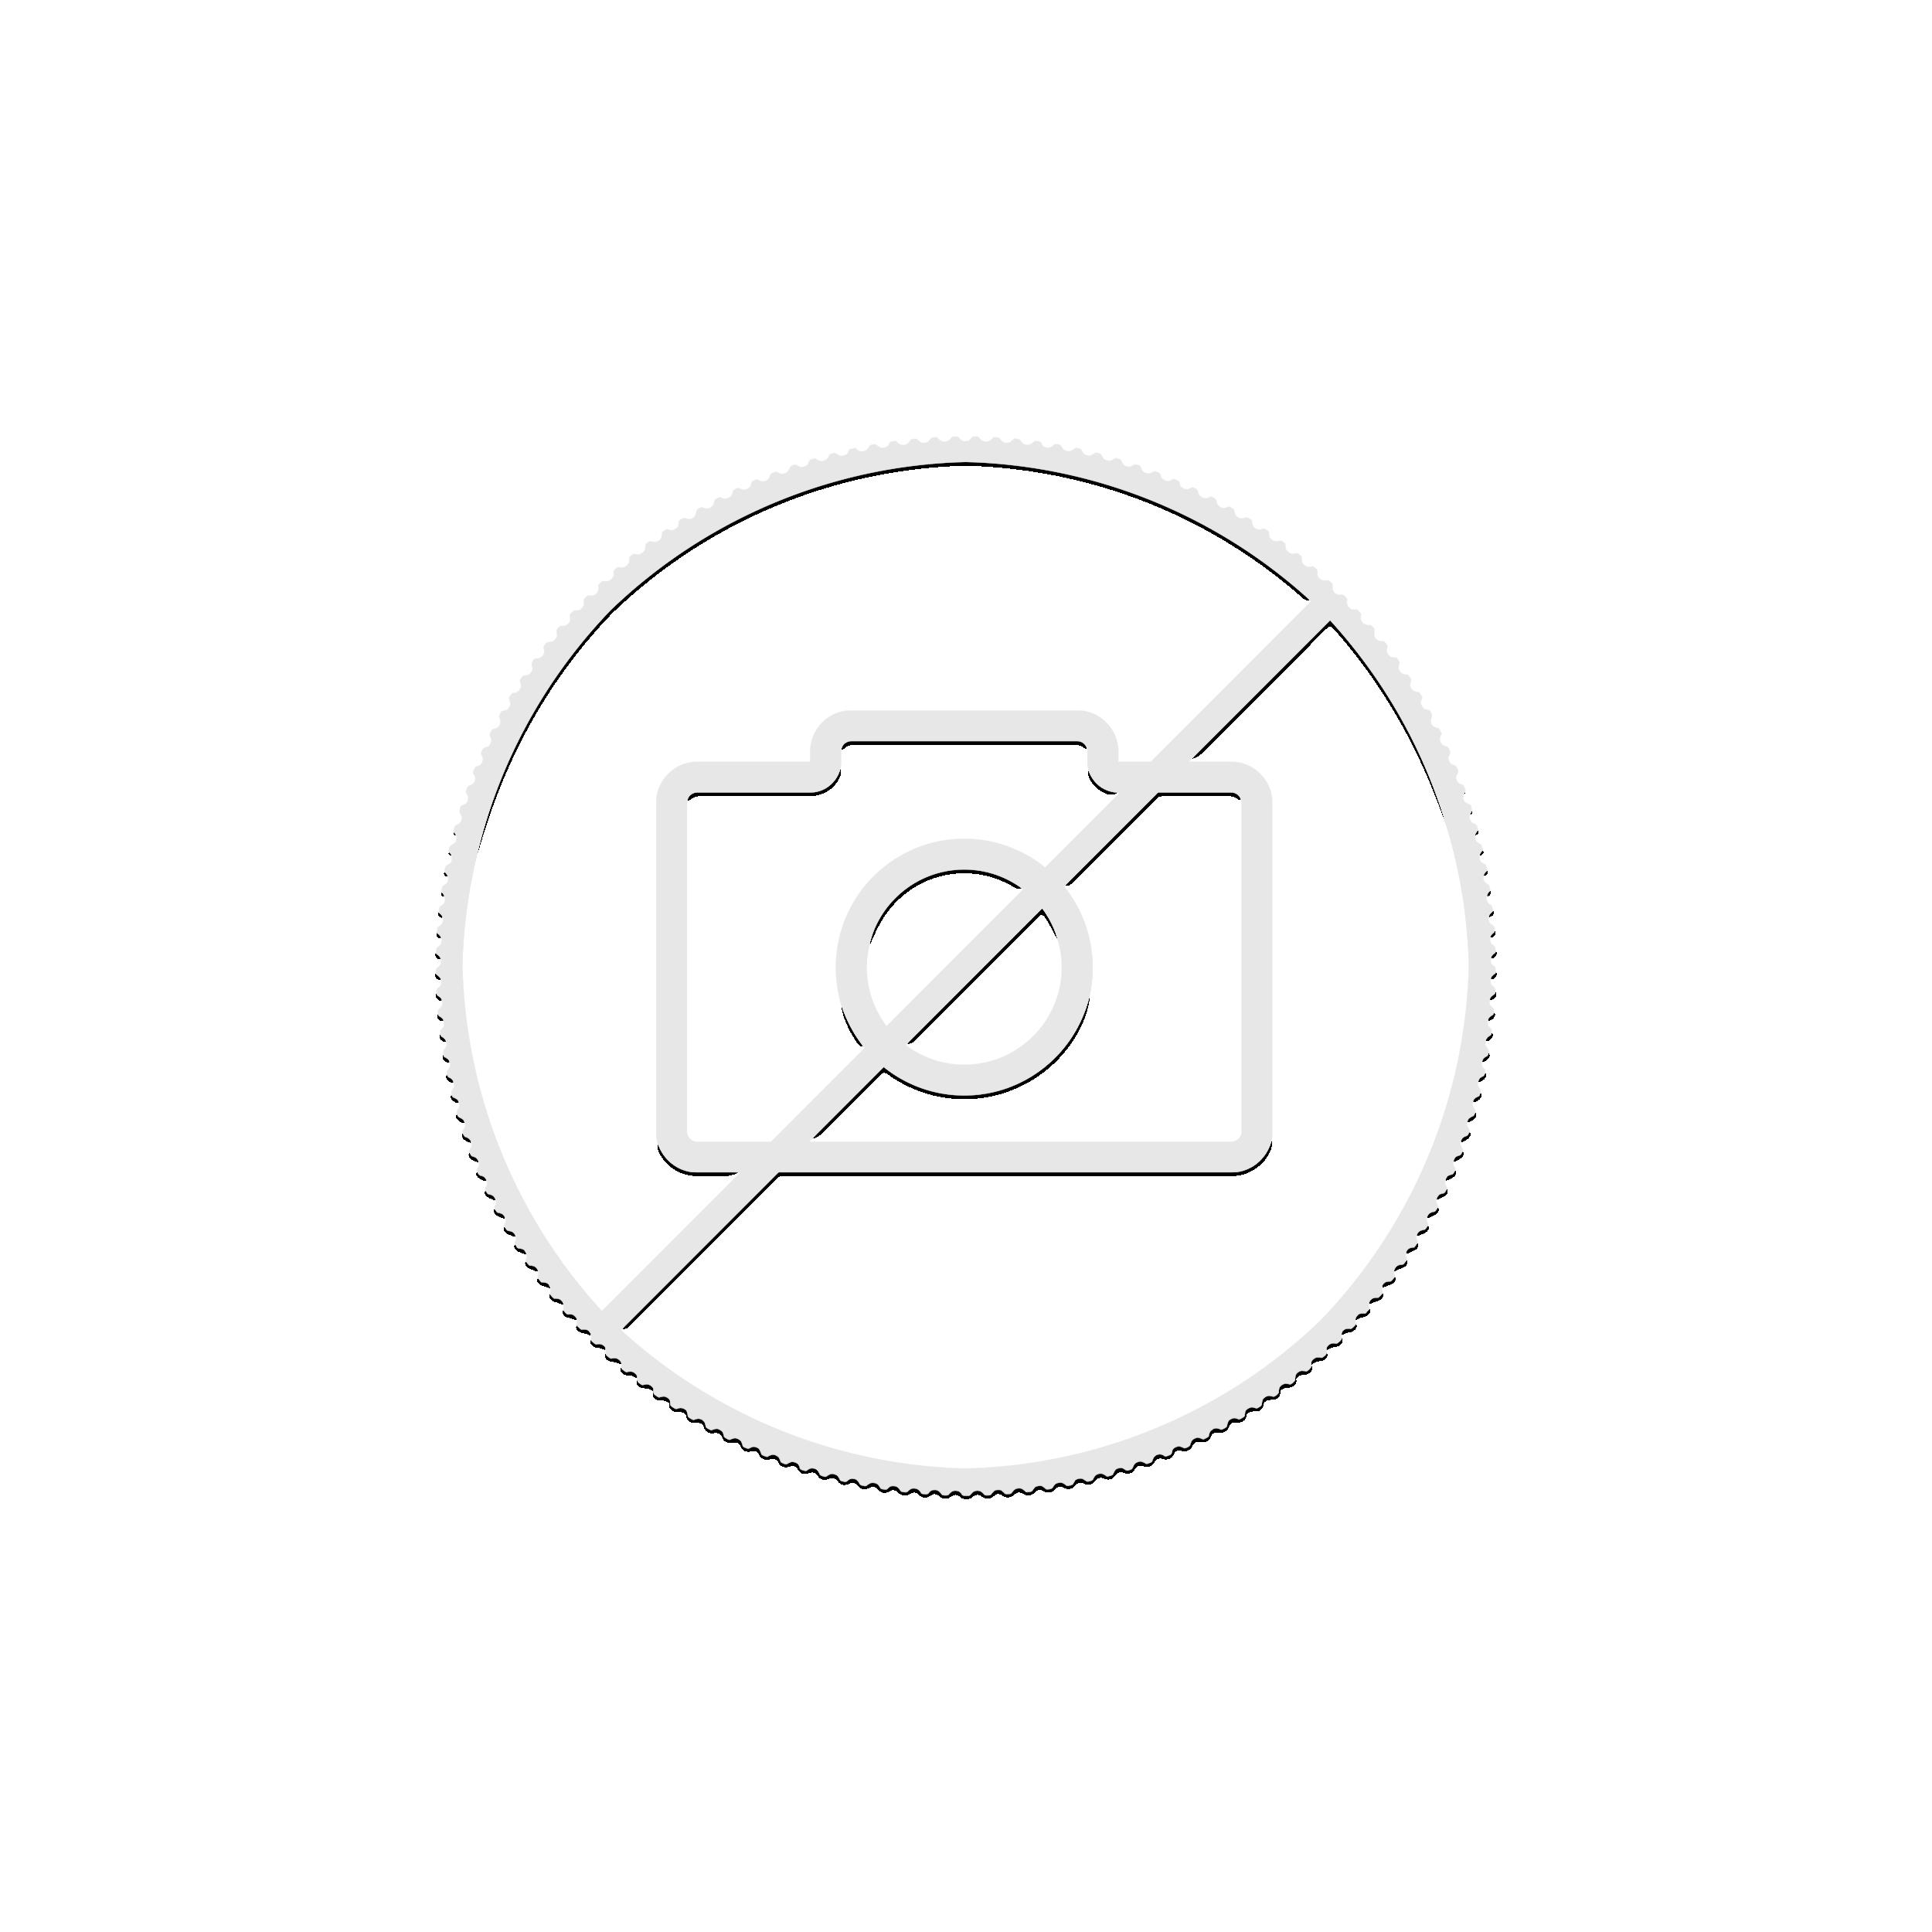 1 Troy ounce zilveren munt Krugerrand 2021 Proof